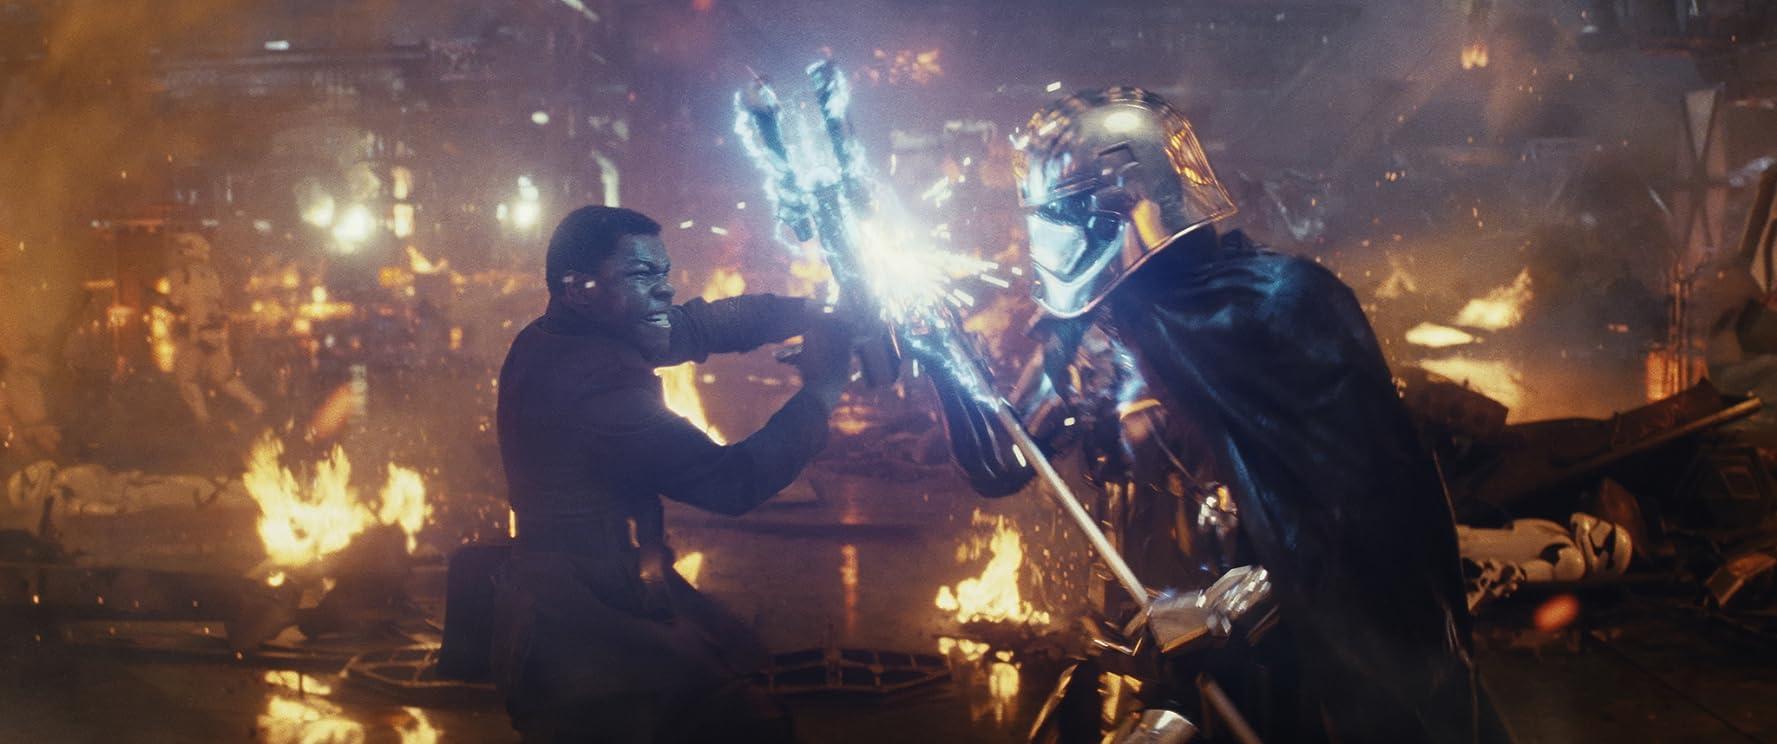 Gwendoline Christie and John Boyega in Star Wars: Episode VIII - The Last Jedi (2017)